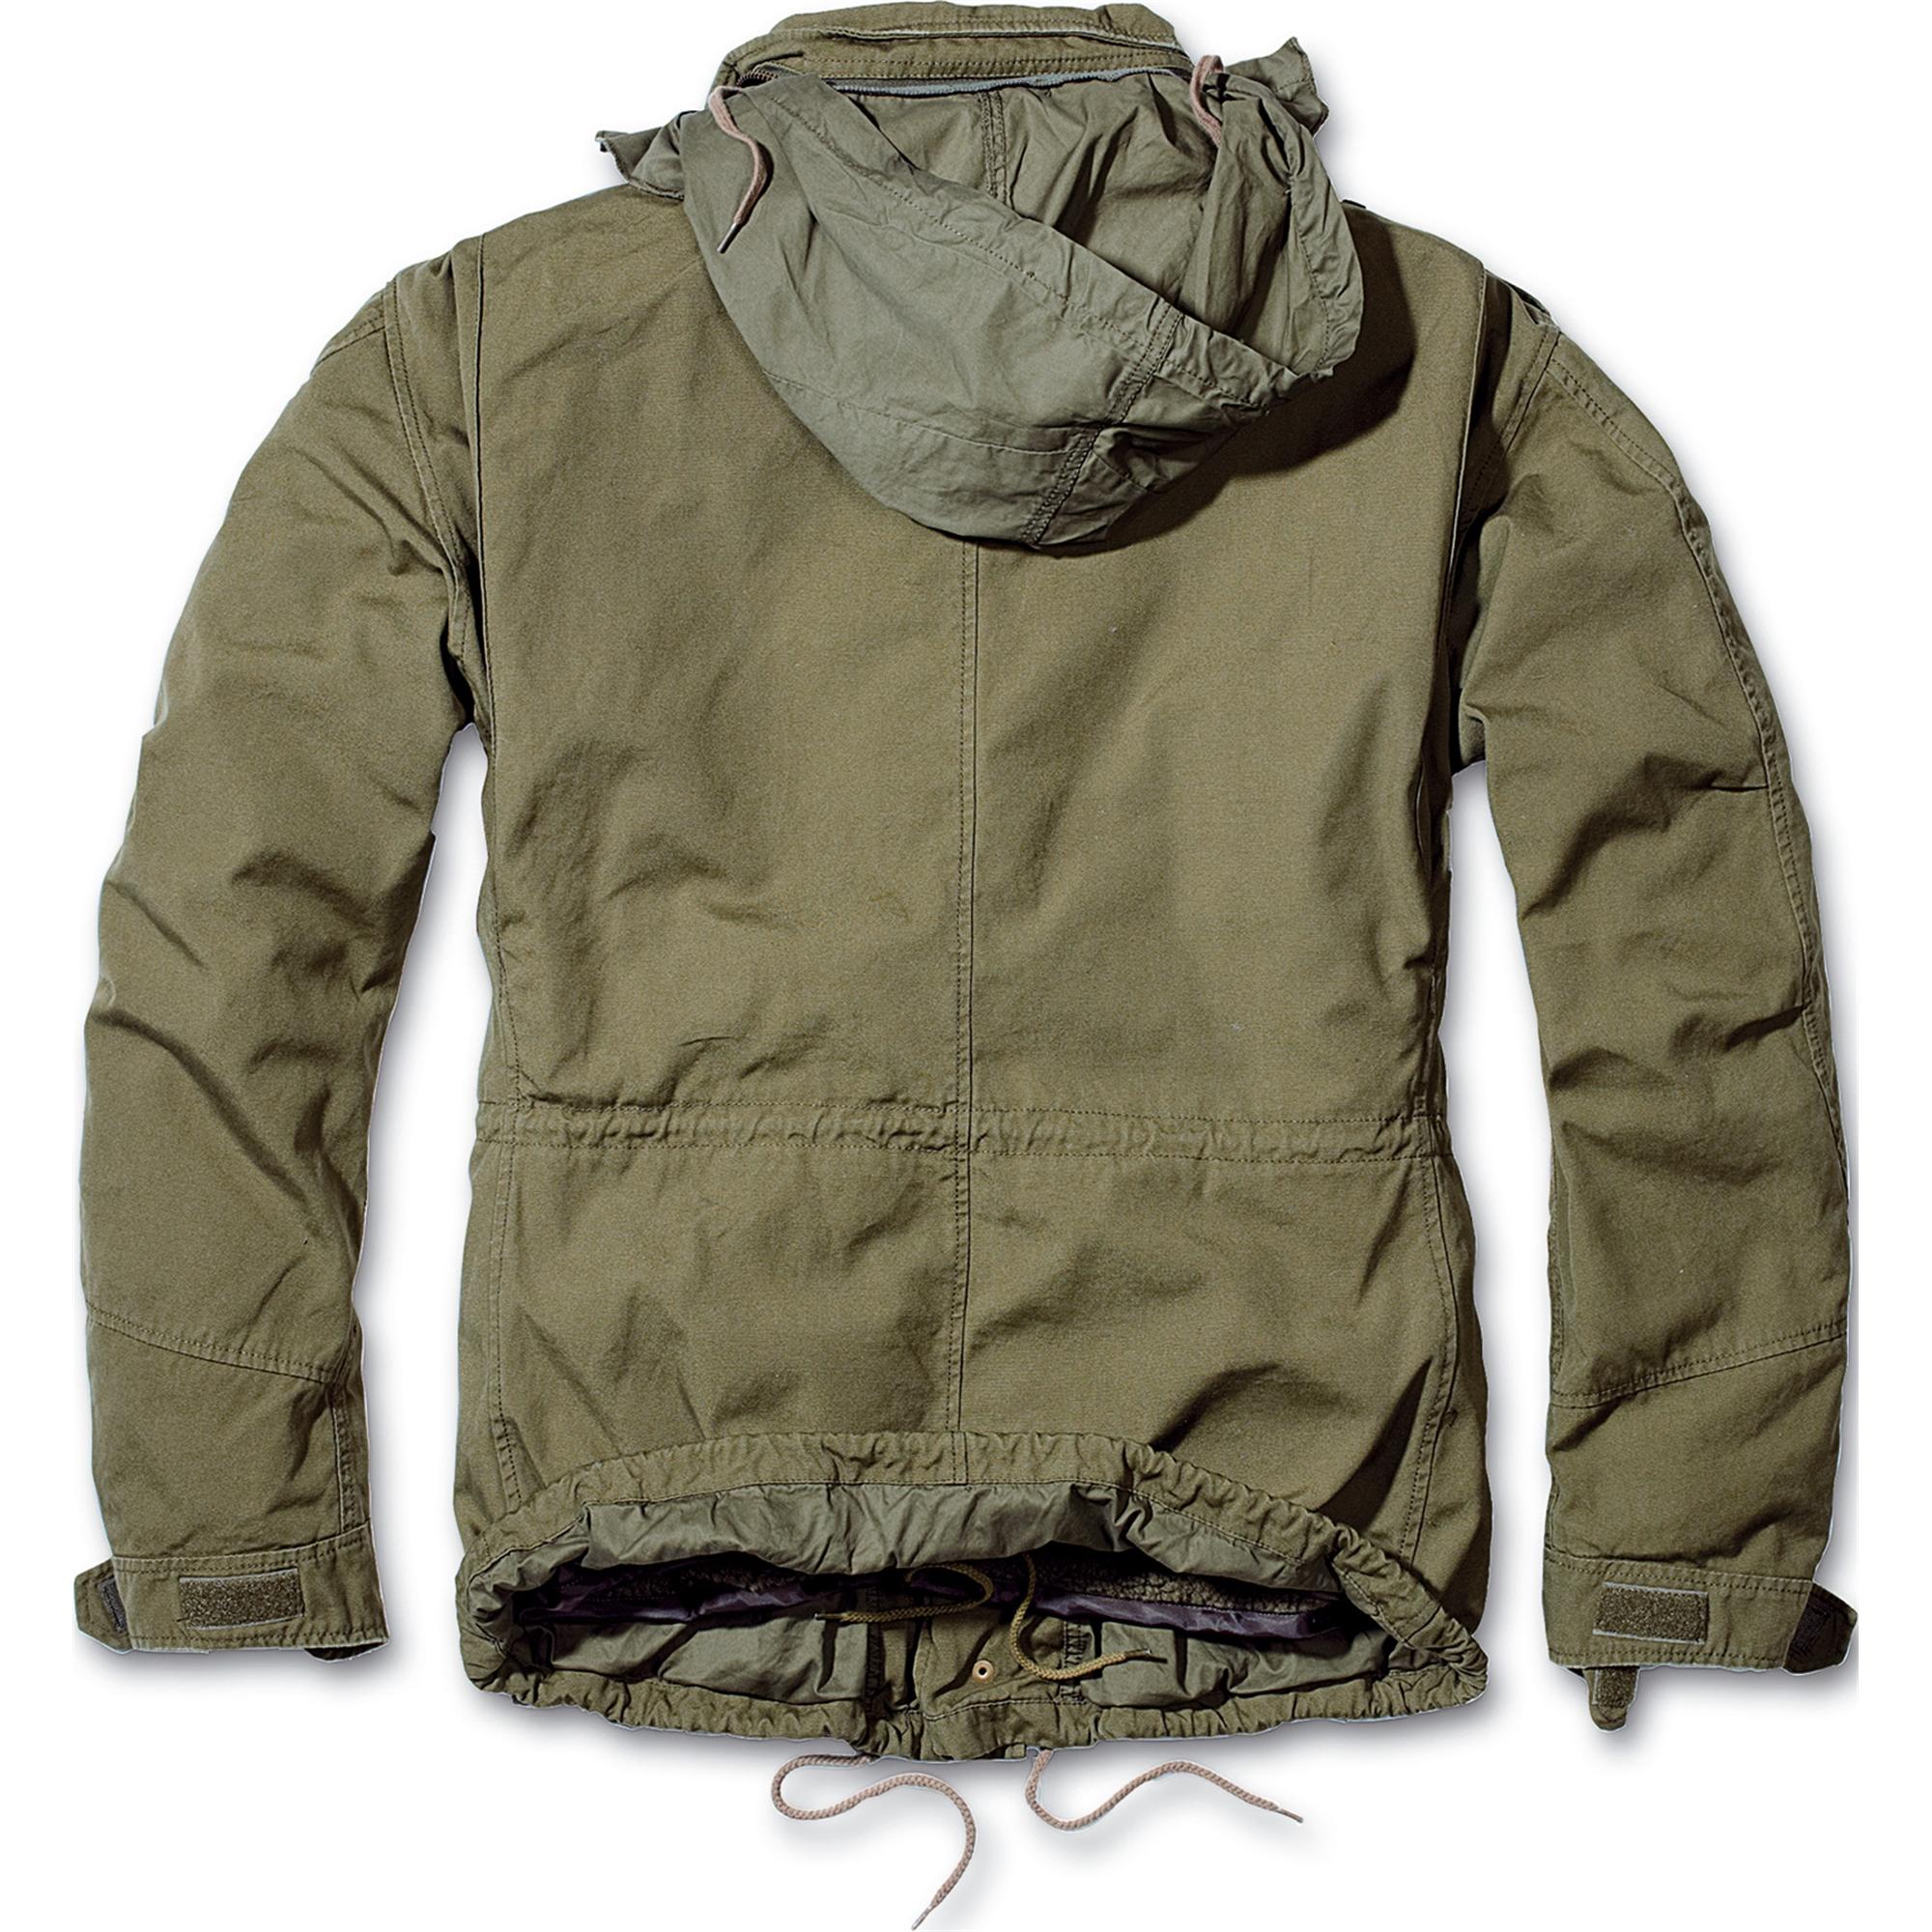 Brandit-M65-Giant-Herren-Jacke-Vintage-Feldjacke-Army-Outdoor-Parka-Futter-S-7XL Indexbild 9